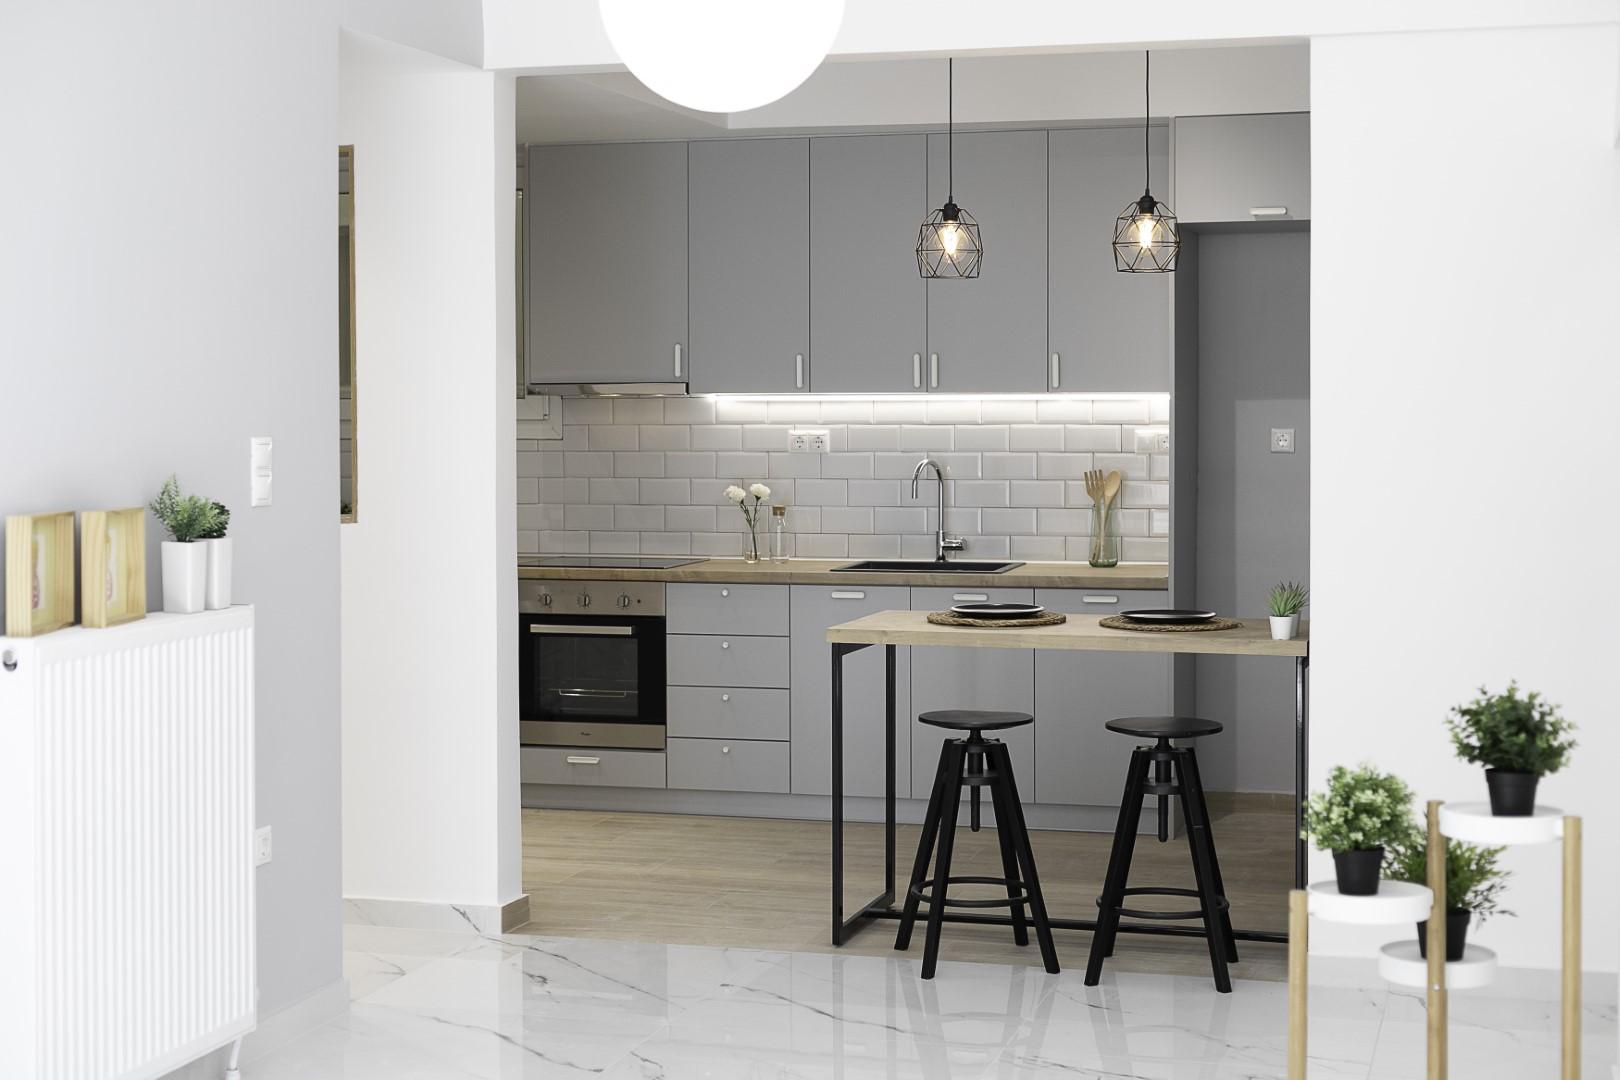 Apartment renovation   Νea Paralia   94 sq.m.   4th floor